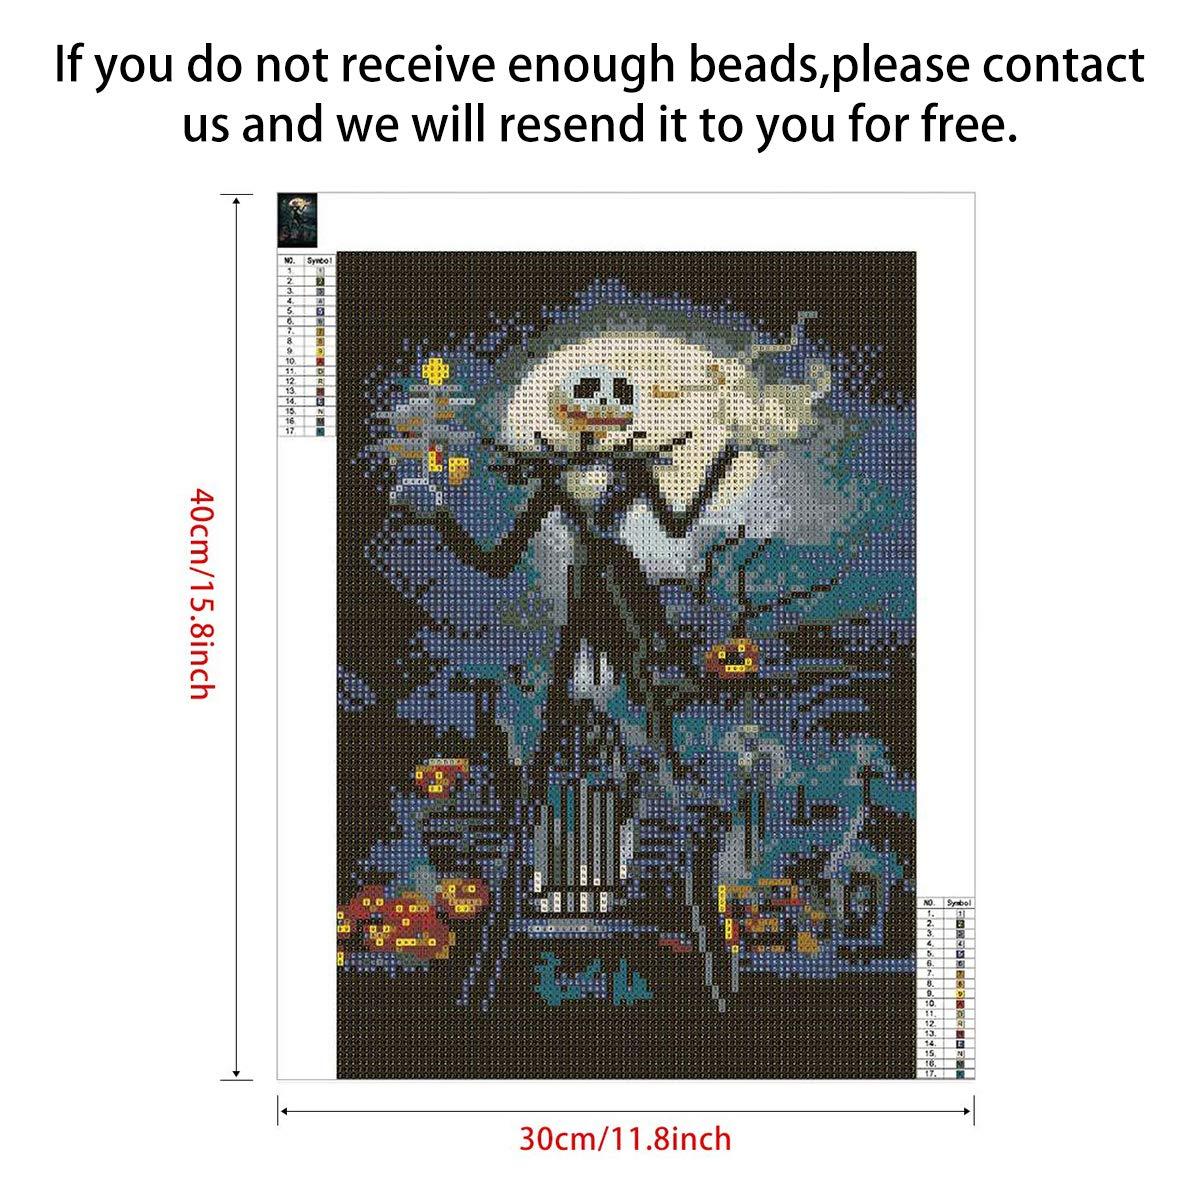 Jack Sally Halloween Skull KISSBUTY DIY Diamond Rhinestone Painting Kits for Adults and Beginner Embroidery Arts Craft Home Decor 2 Pack 5D Full Drill Diamond Painting Kit 15.8 X 11.8 Inch